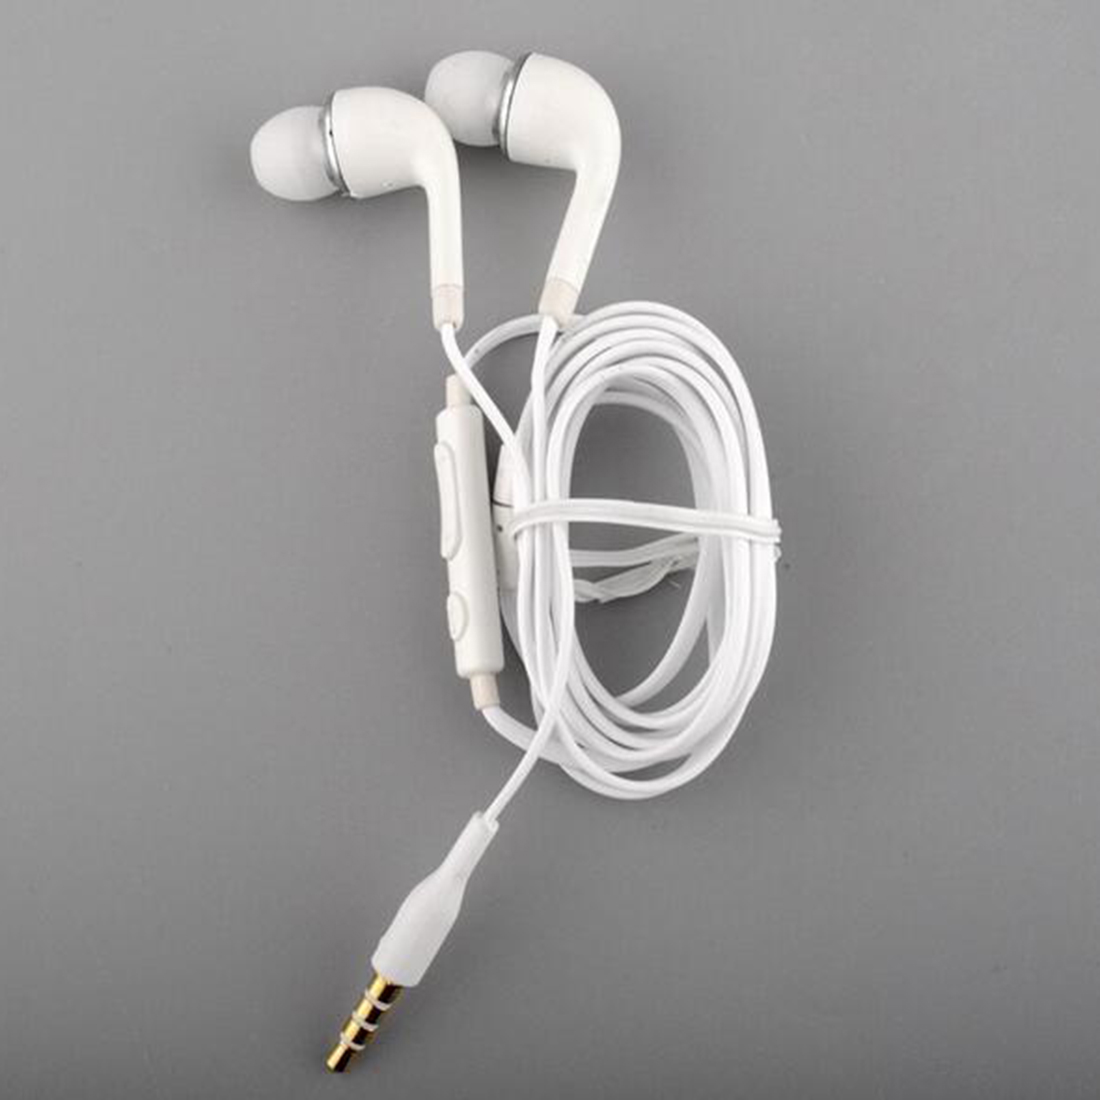 Samsung Headphone J5 Earphone Headset Original Putih Referensi Knowledge Zenith Bluetooth 41 Aptx Lossless Kz Hdse Marsnaska Brand New High Quality White Handsfree In Ear Earphones For Galaxy S4